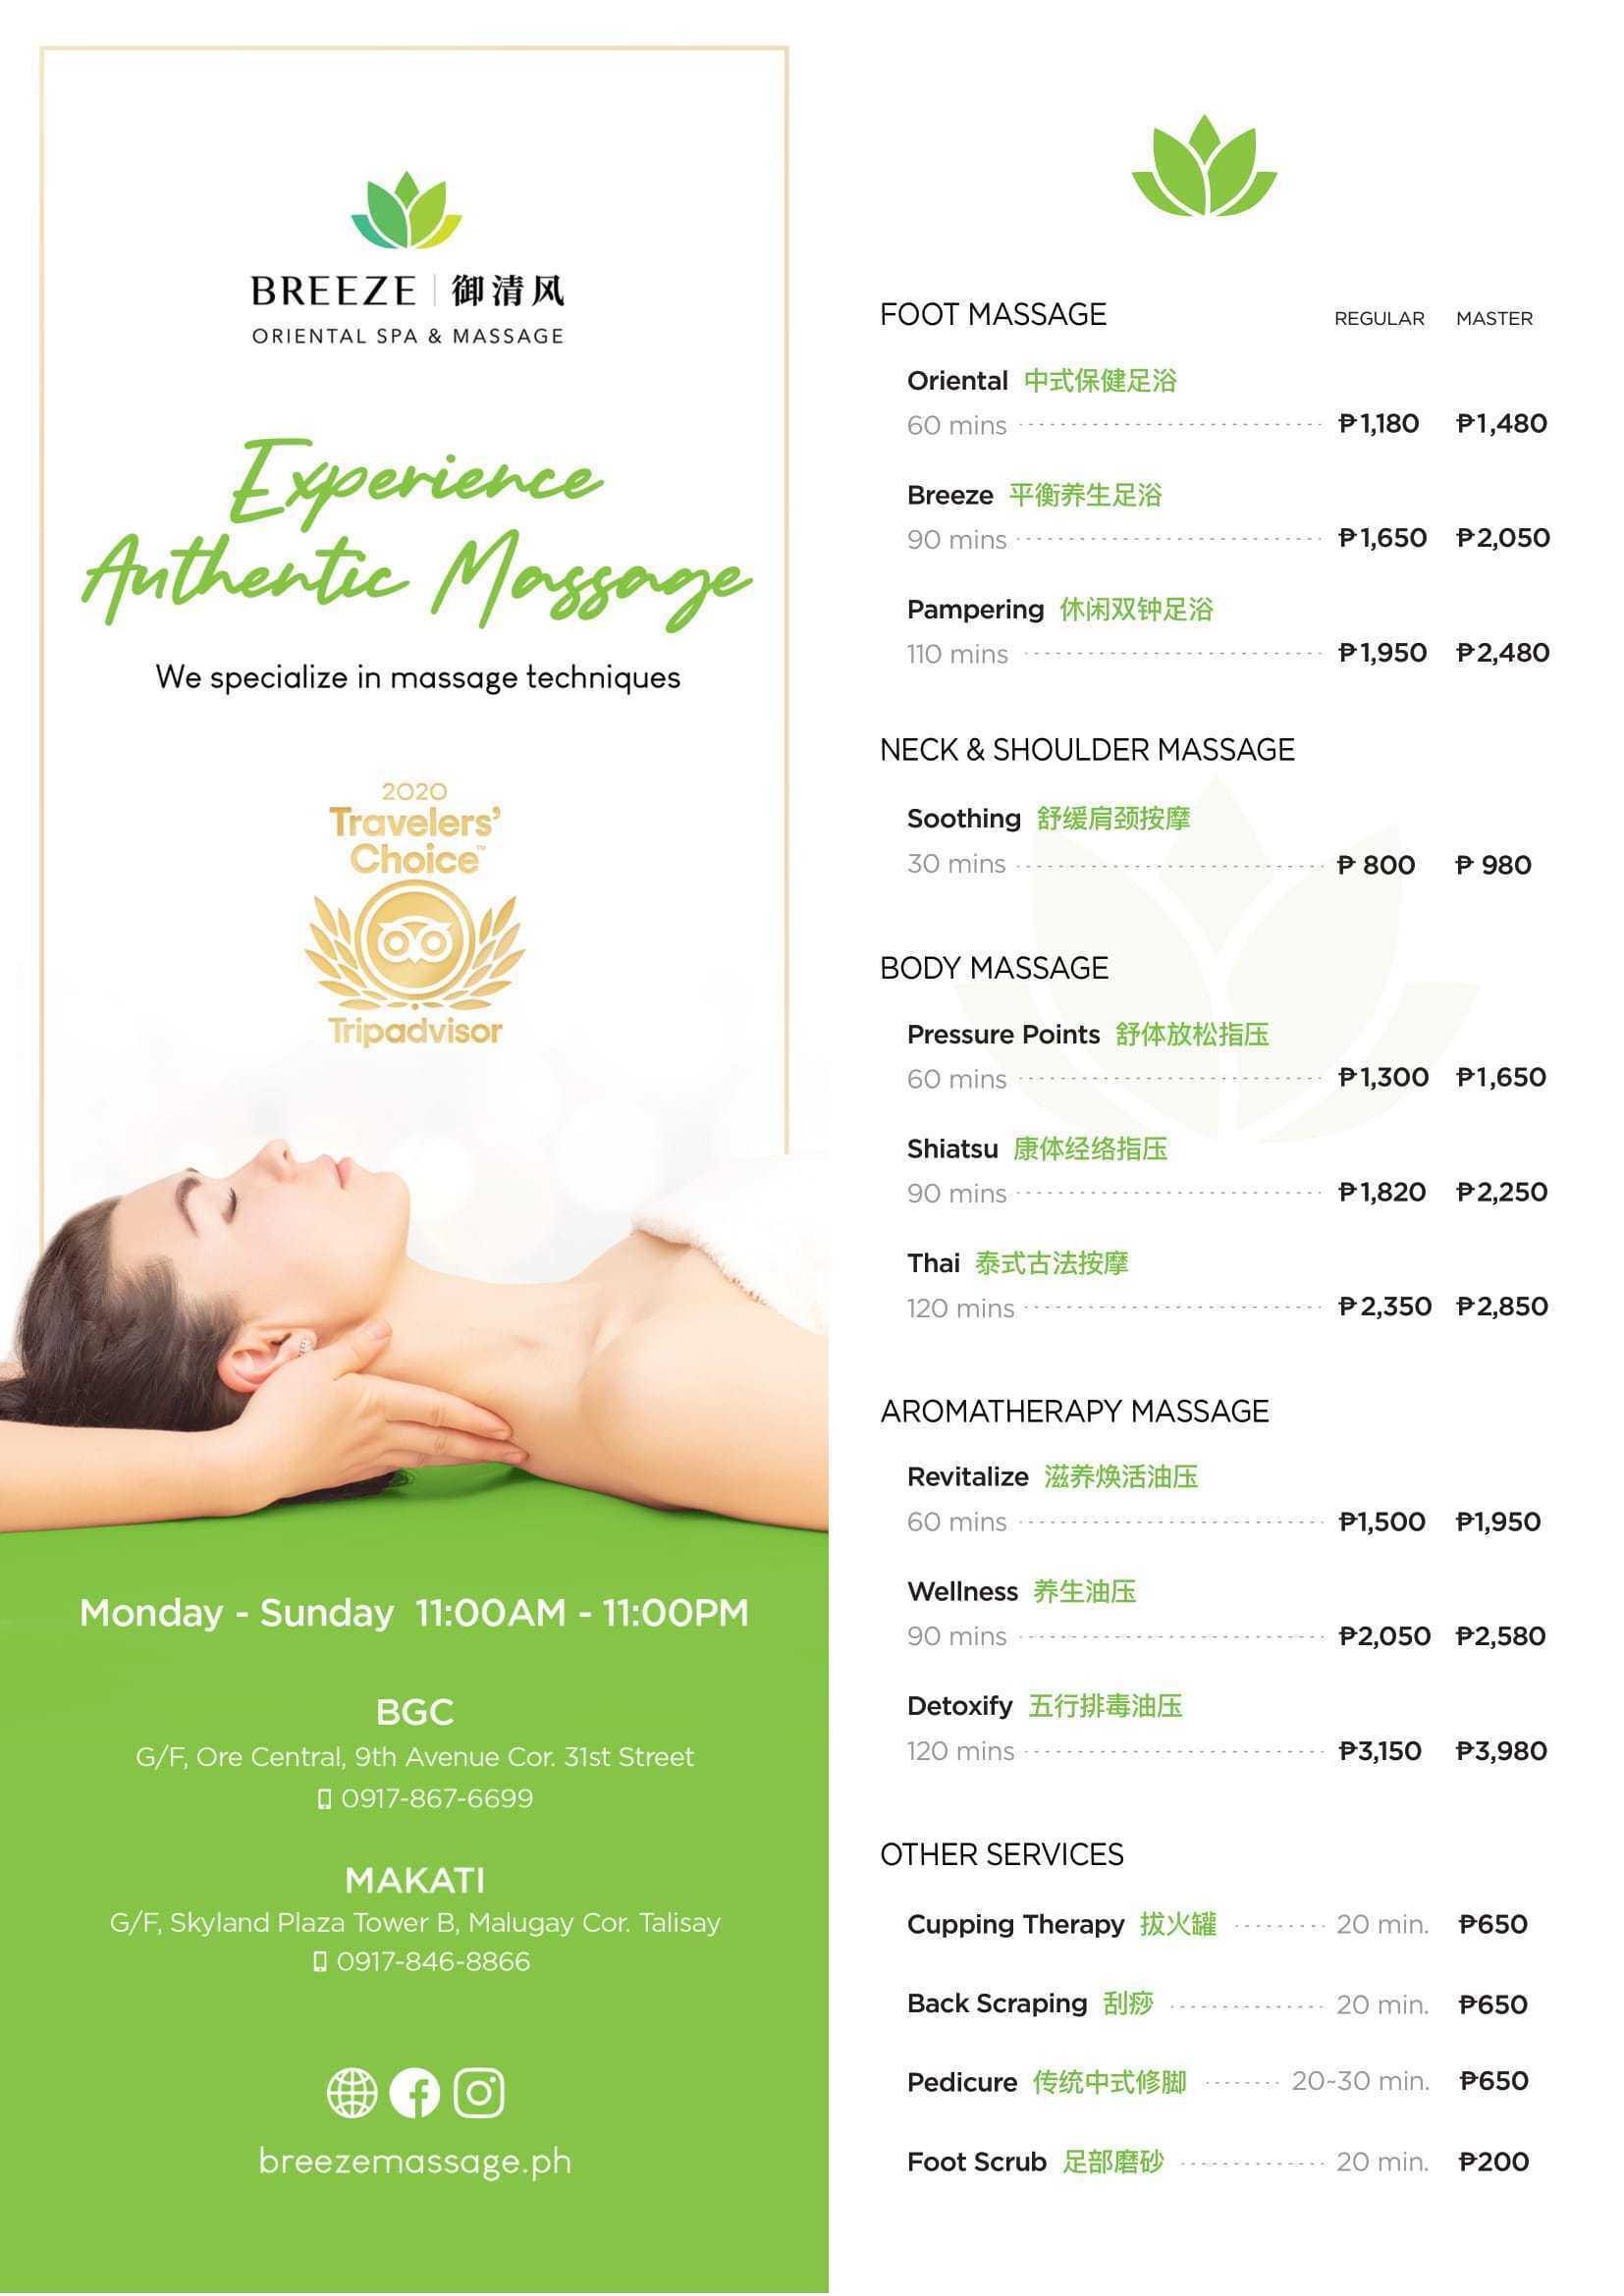 updated-services-menu-breeze-oriental-spa-massage